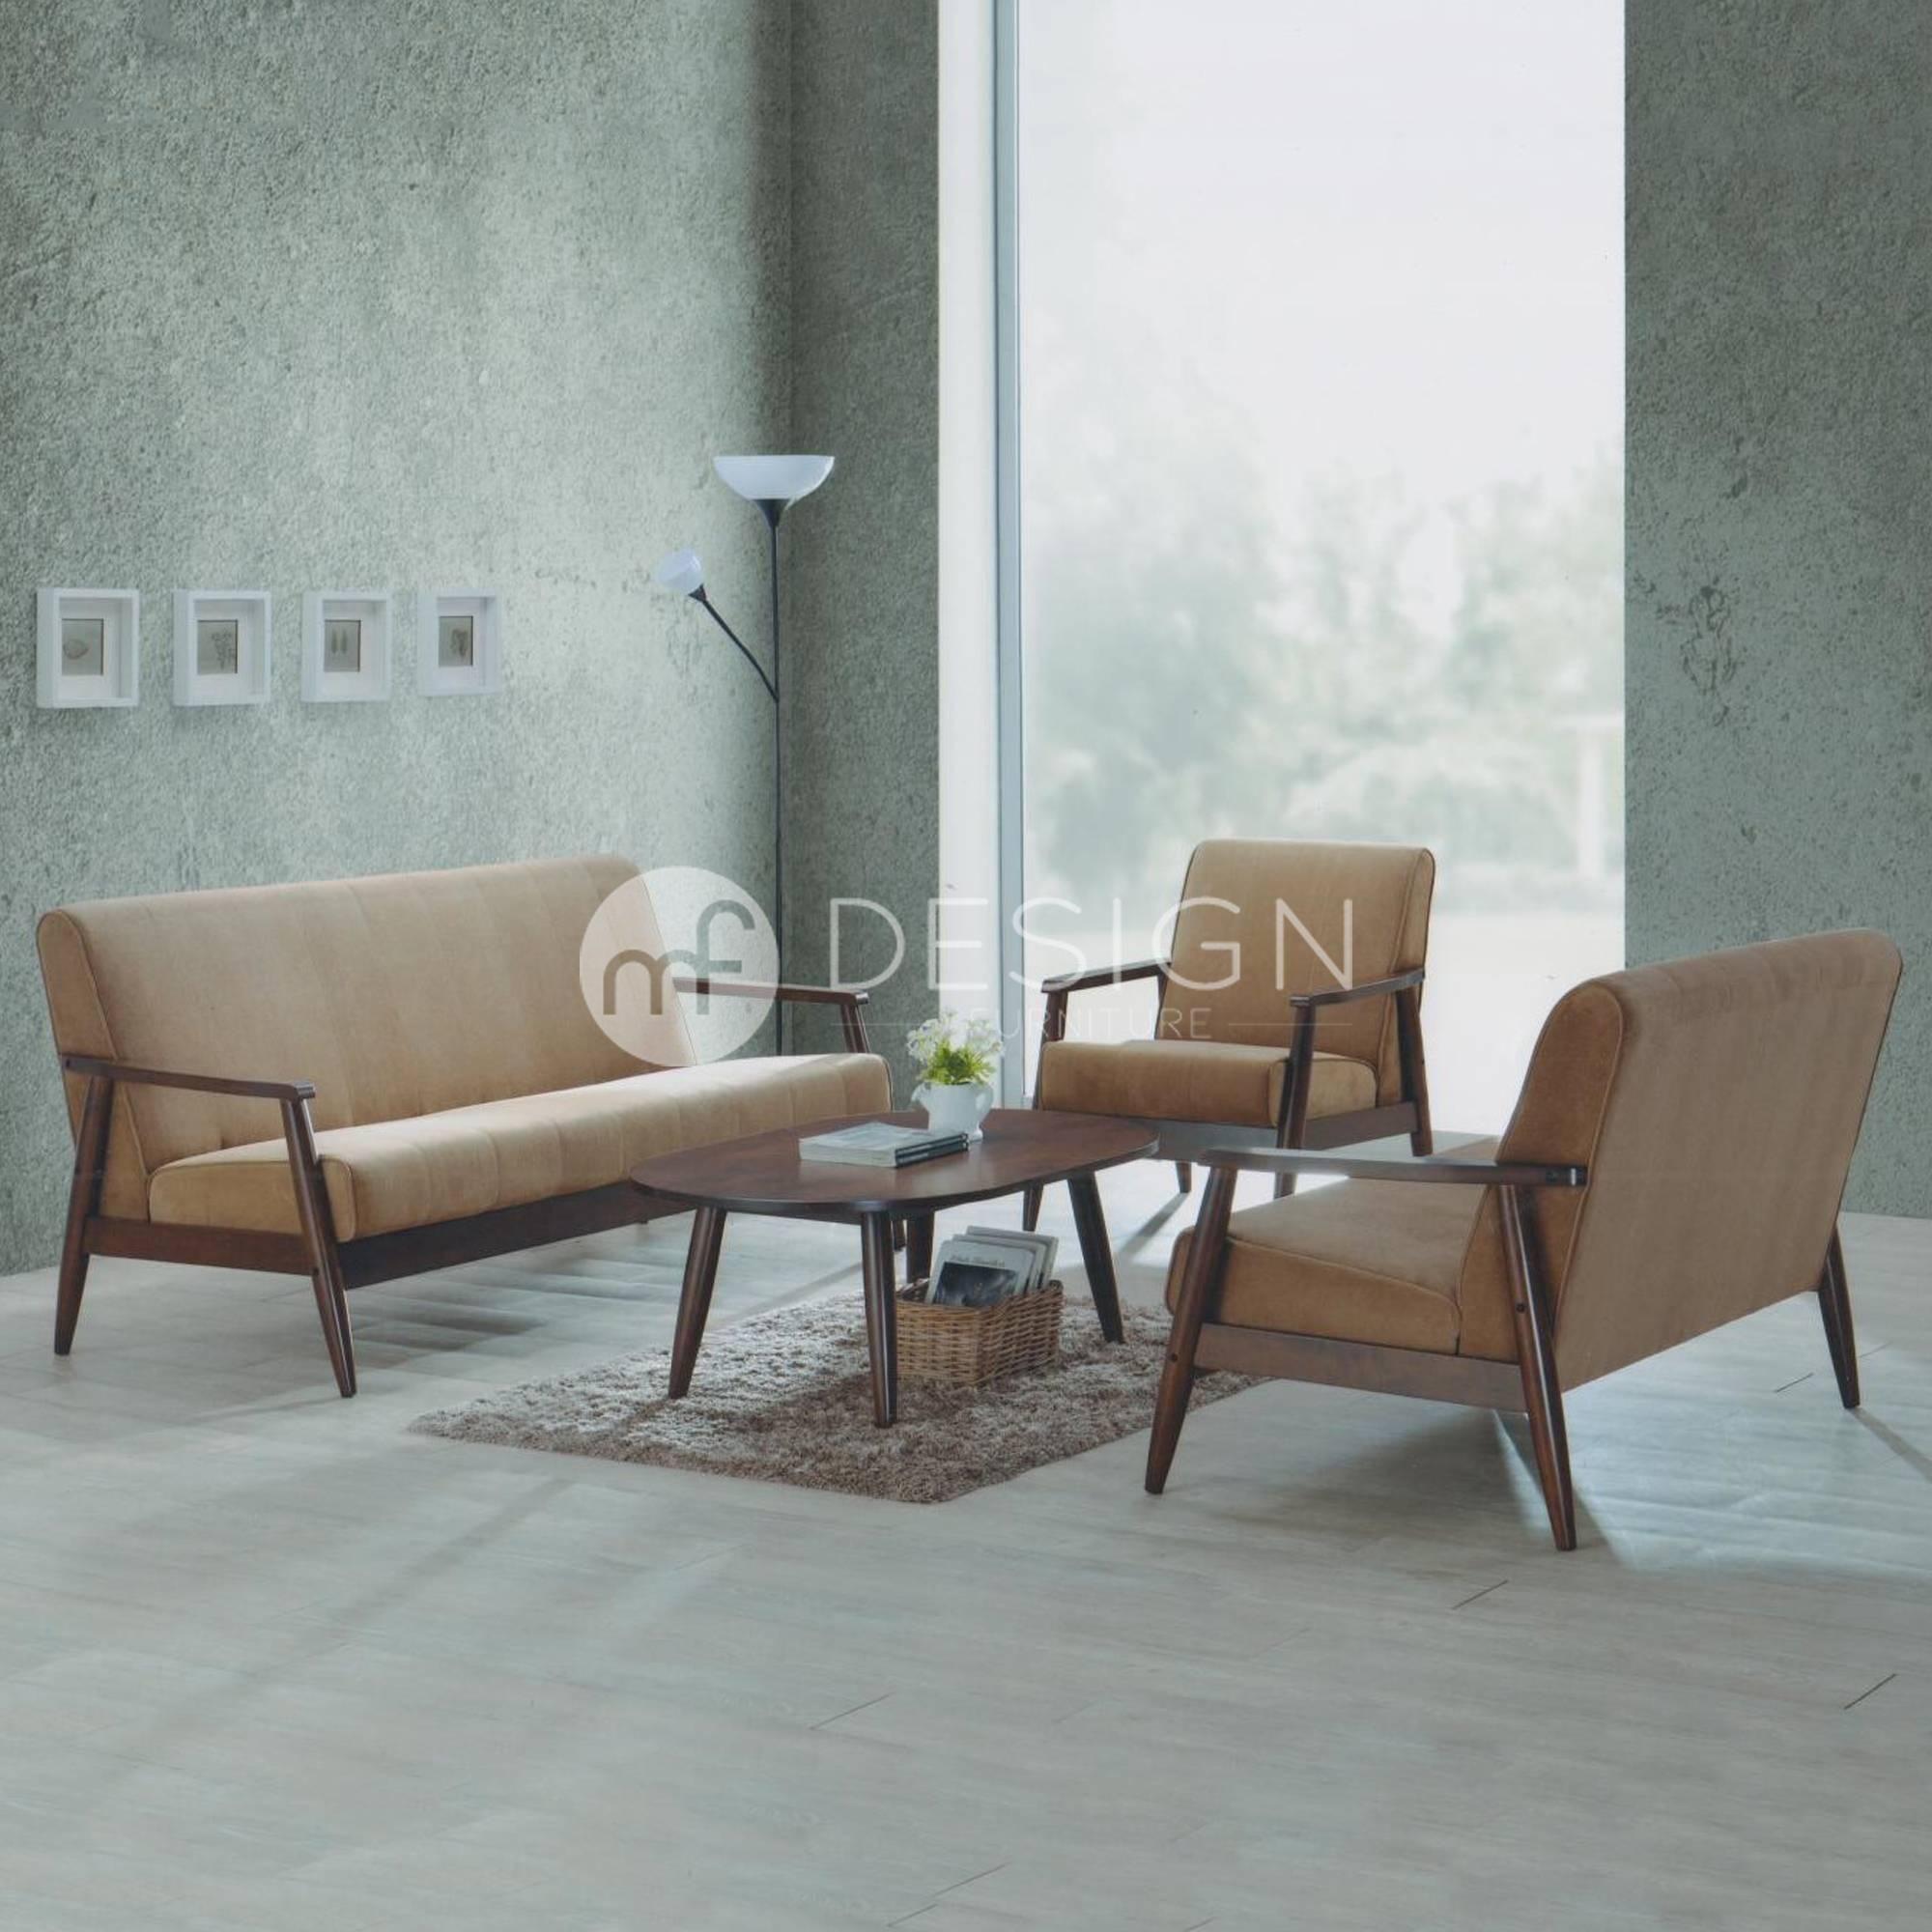 Furniture Design Malaysia boss 1+2+3+table antique wooden arm sofa | mf design - malaysian